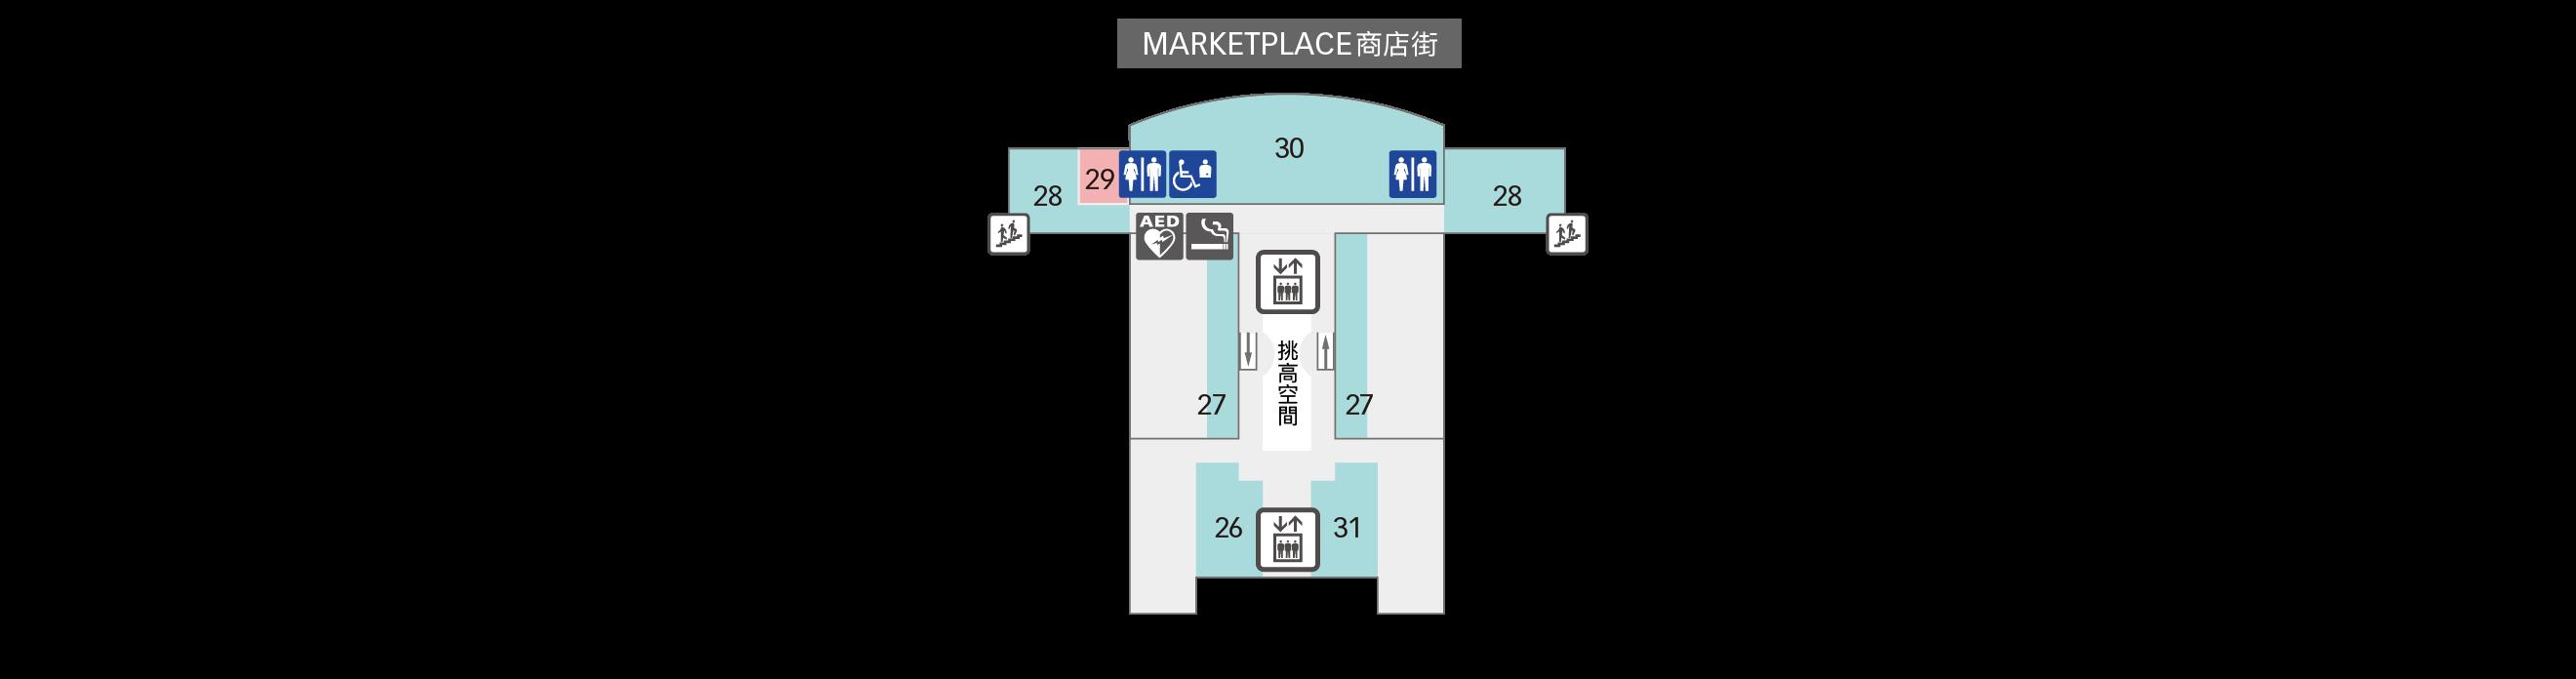 6F 會議廳・觀景台 樓層地圖